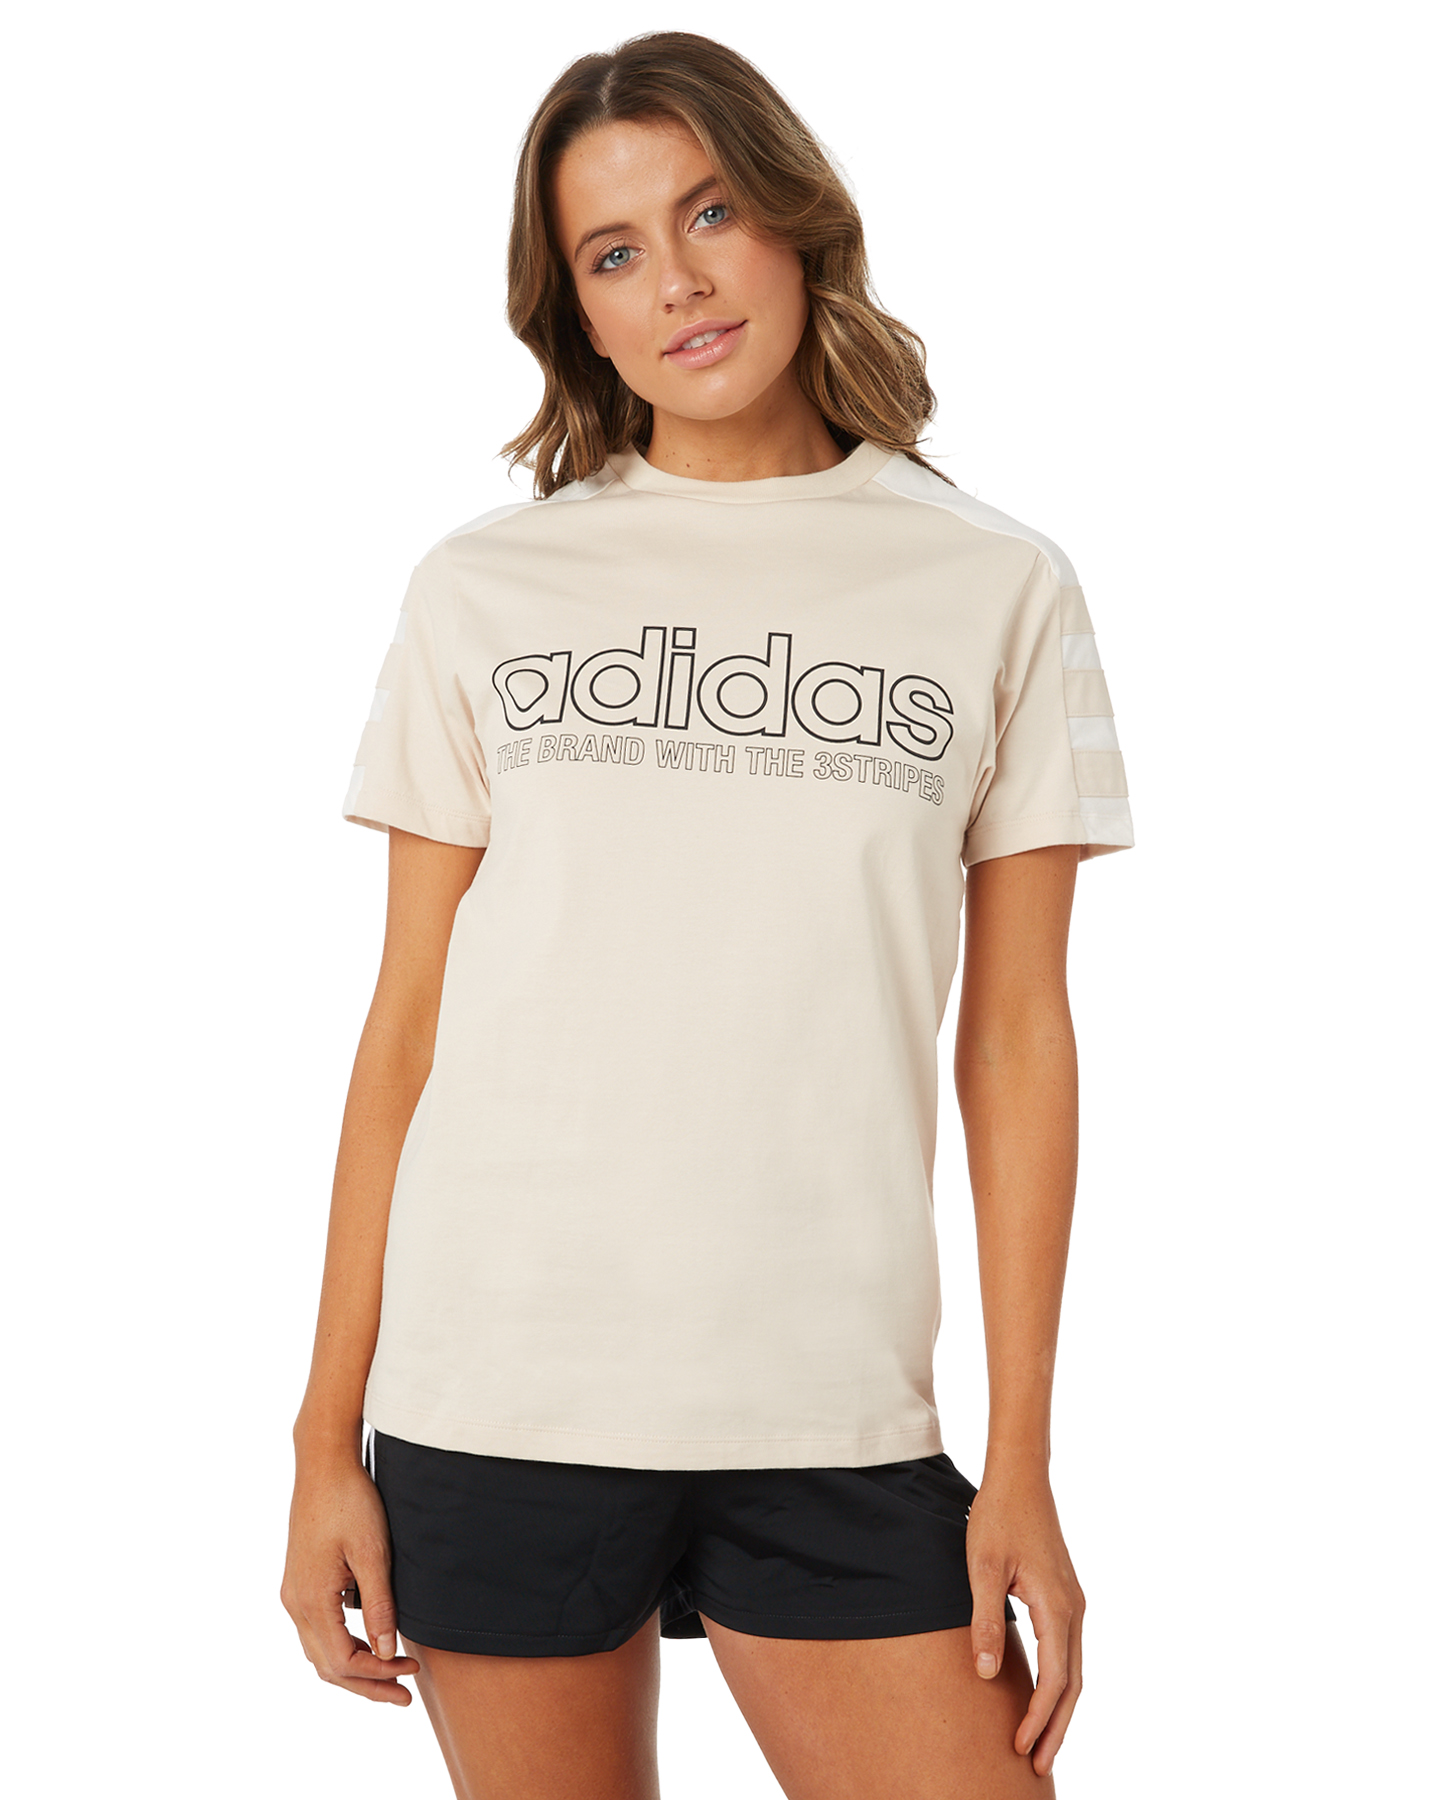 bf6b8f80273 Adidas Tshirt Short Sleeve Linen Linen Womens shirts Size 10 ...